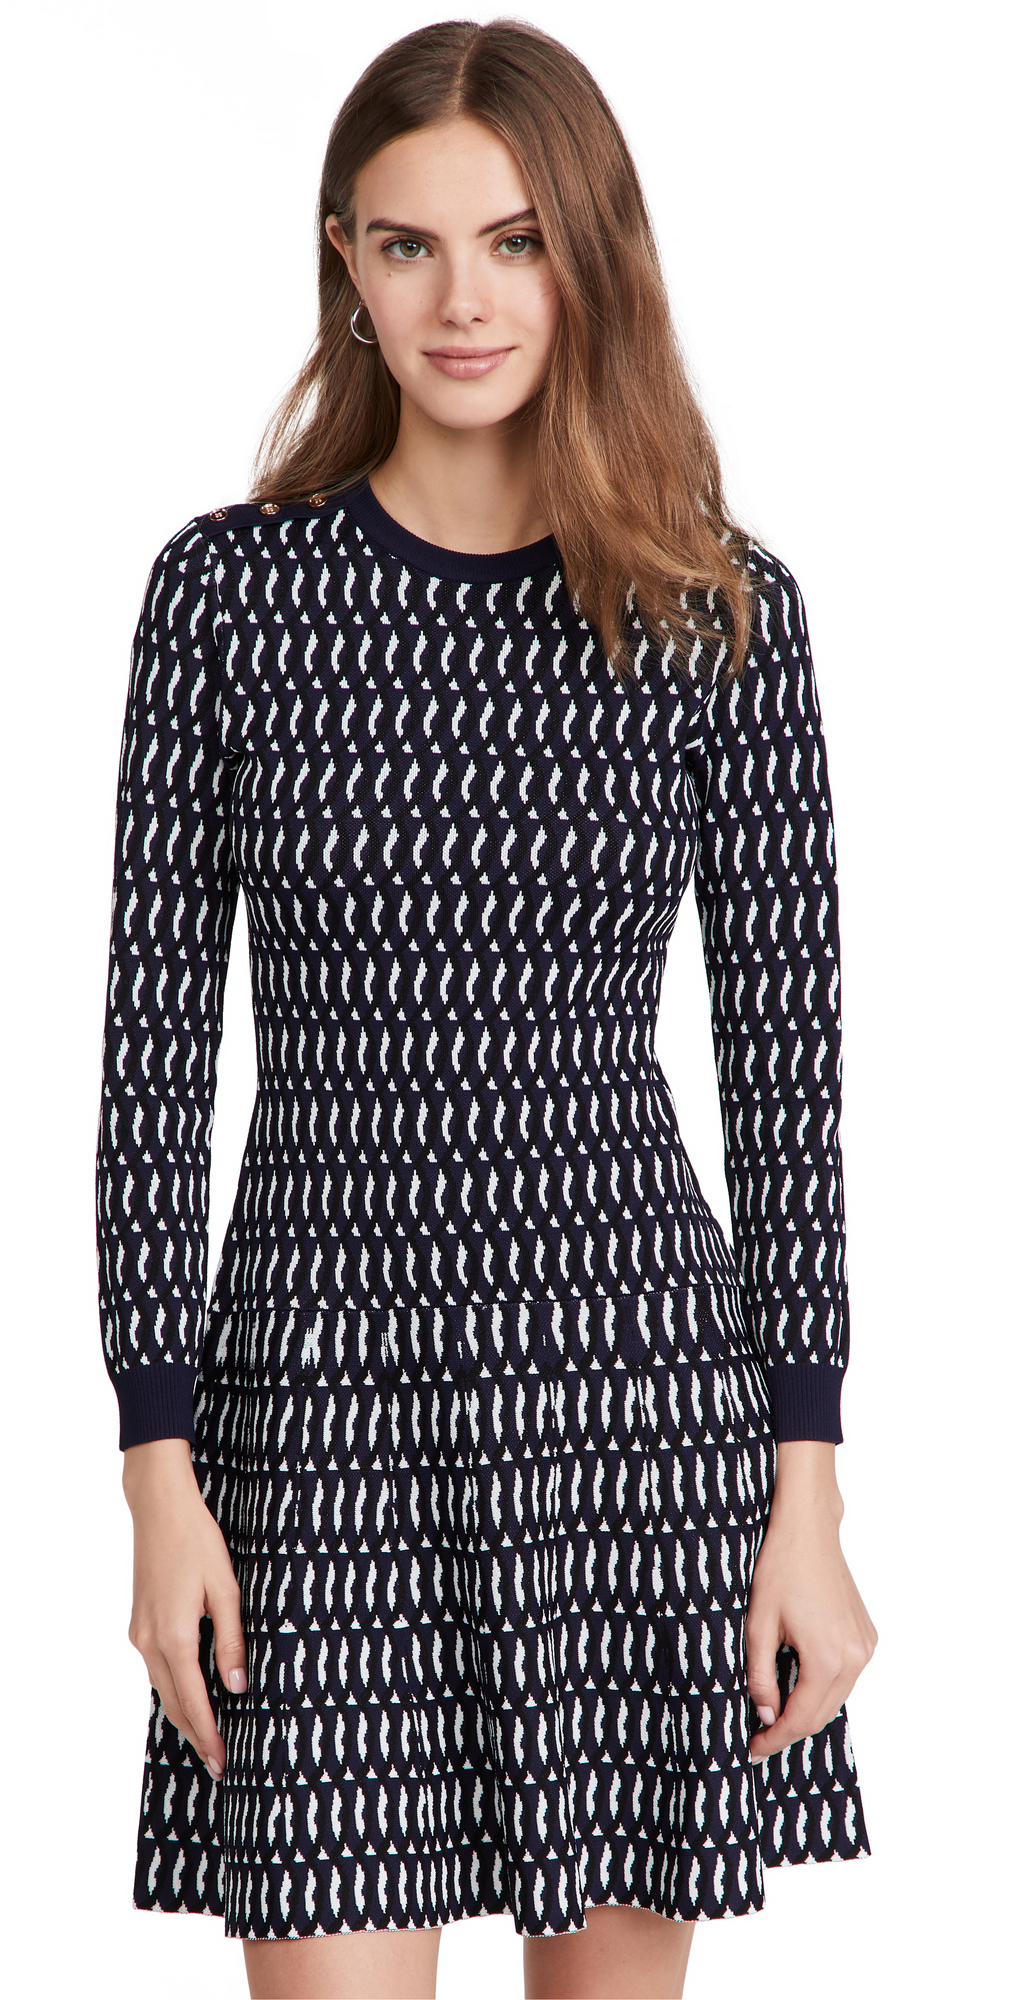 Shoshanna Aspen Dress